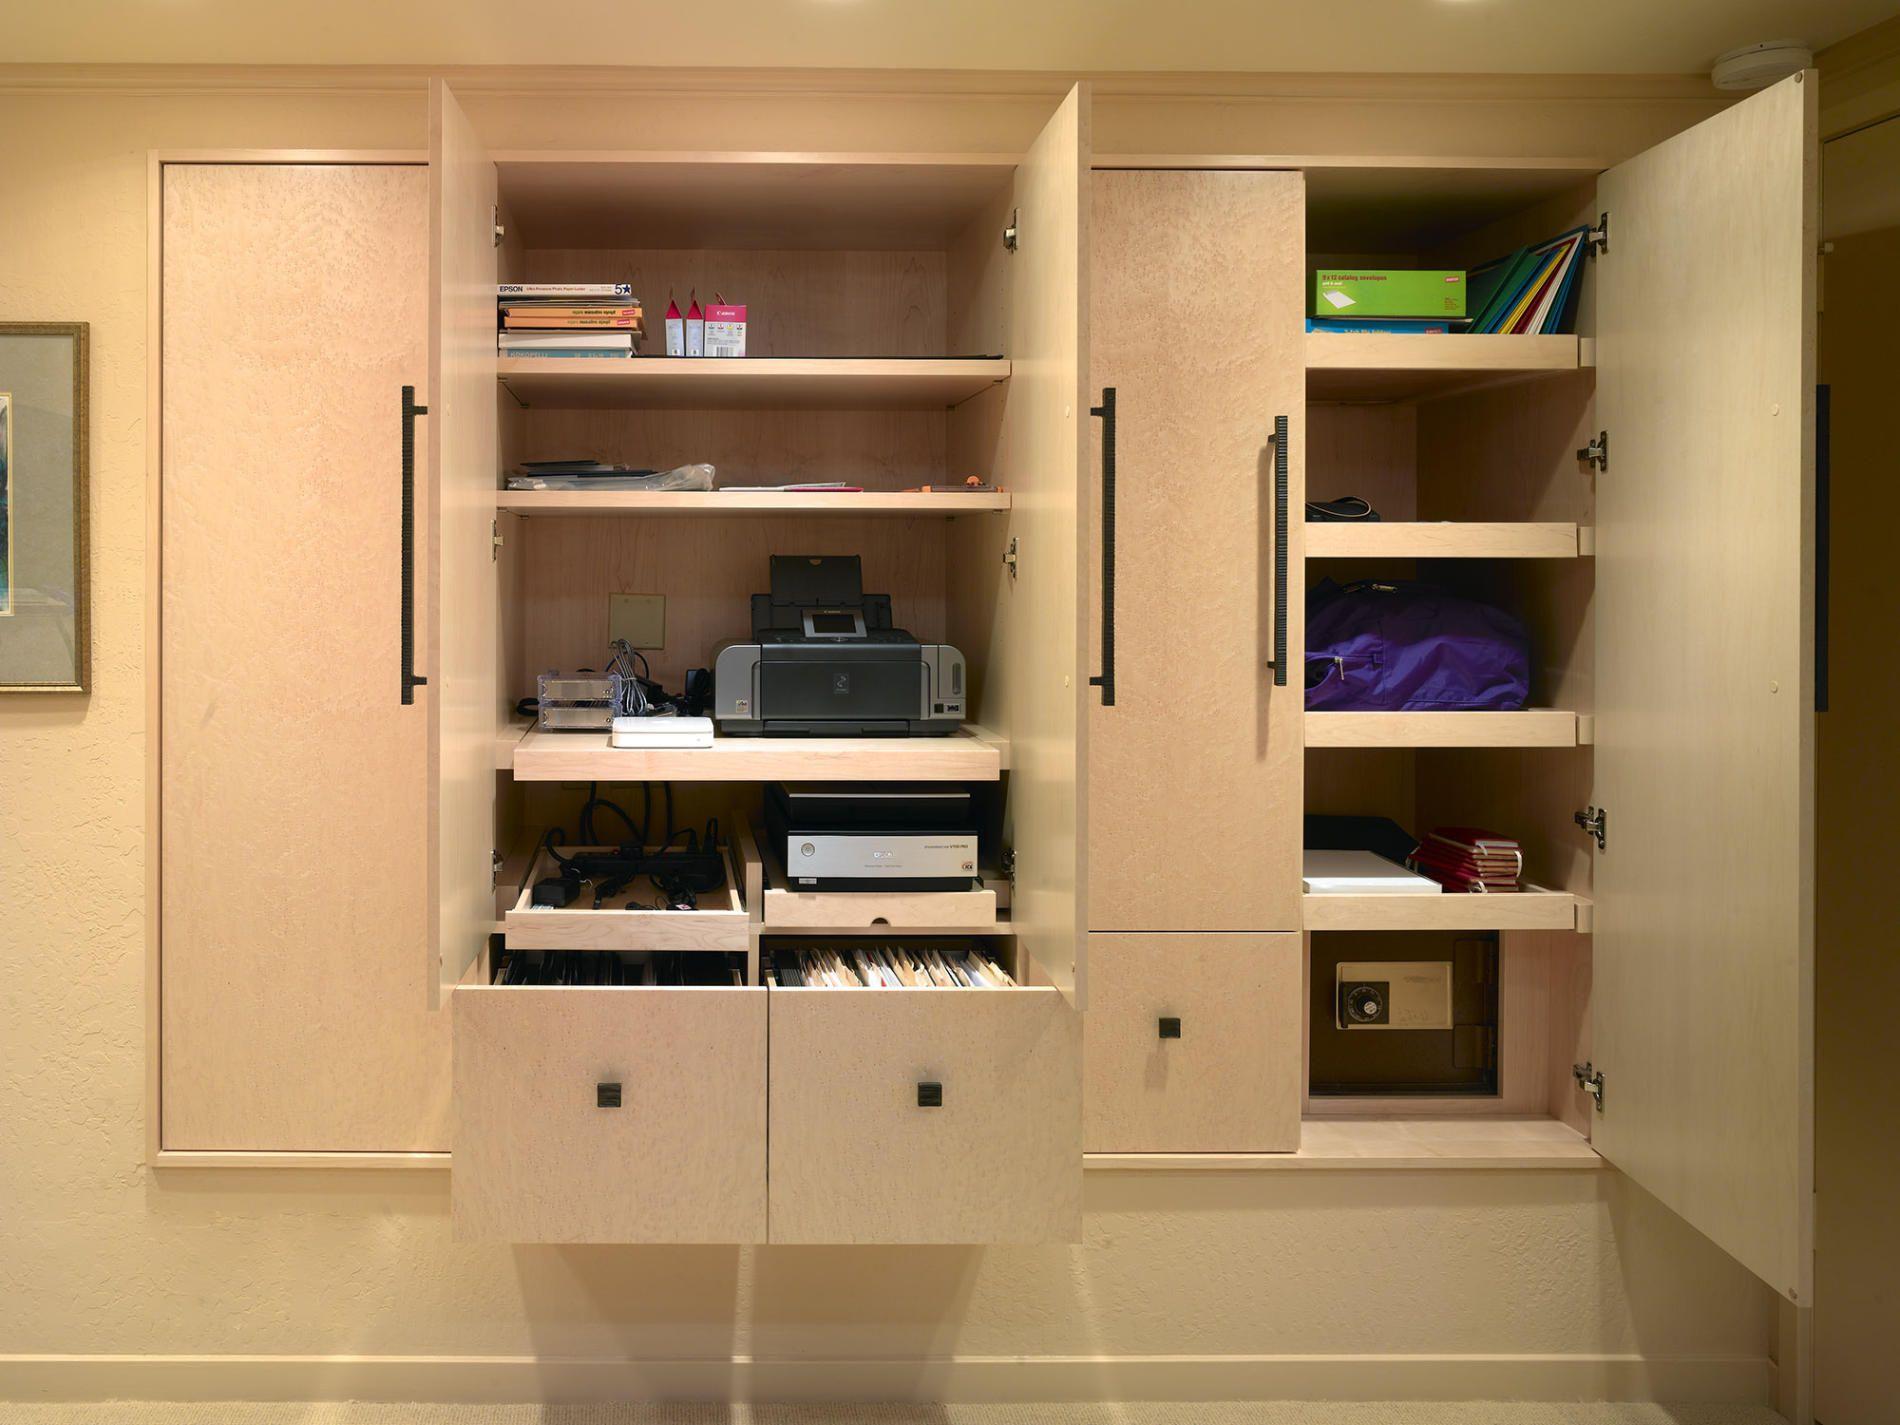 Wall Cabinet Design Ideas - Google Search